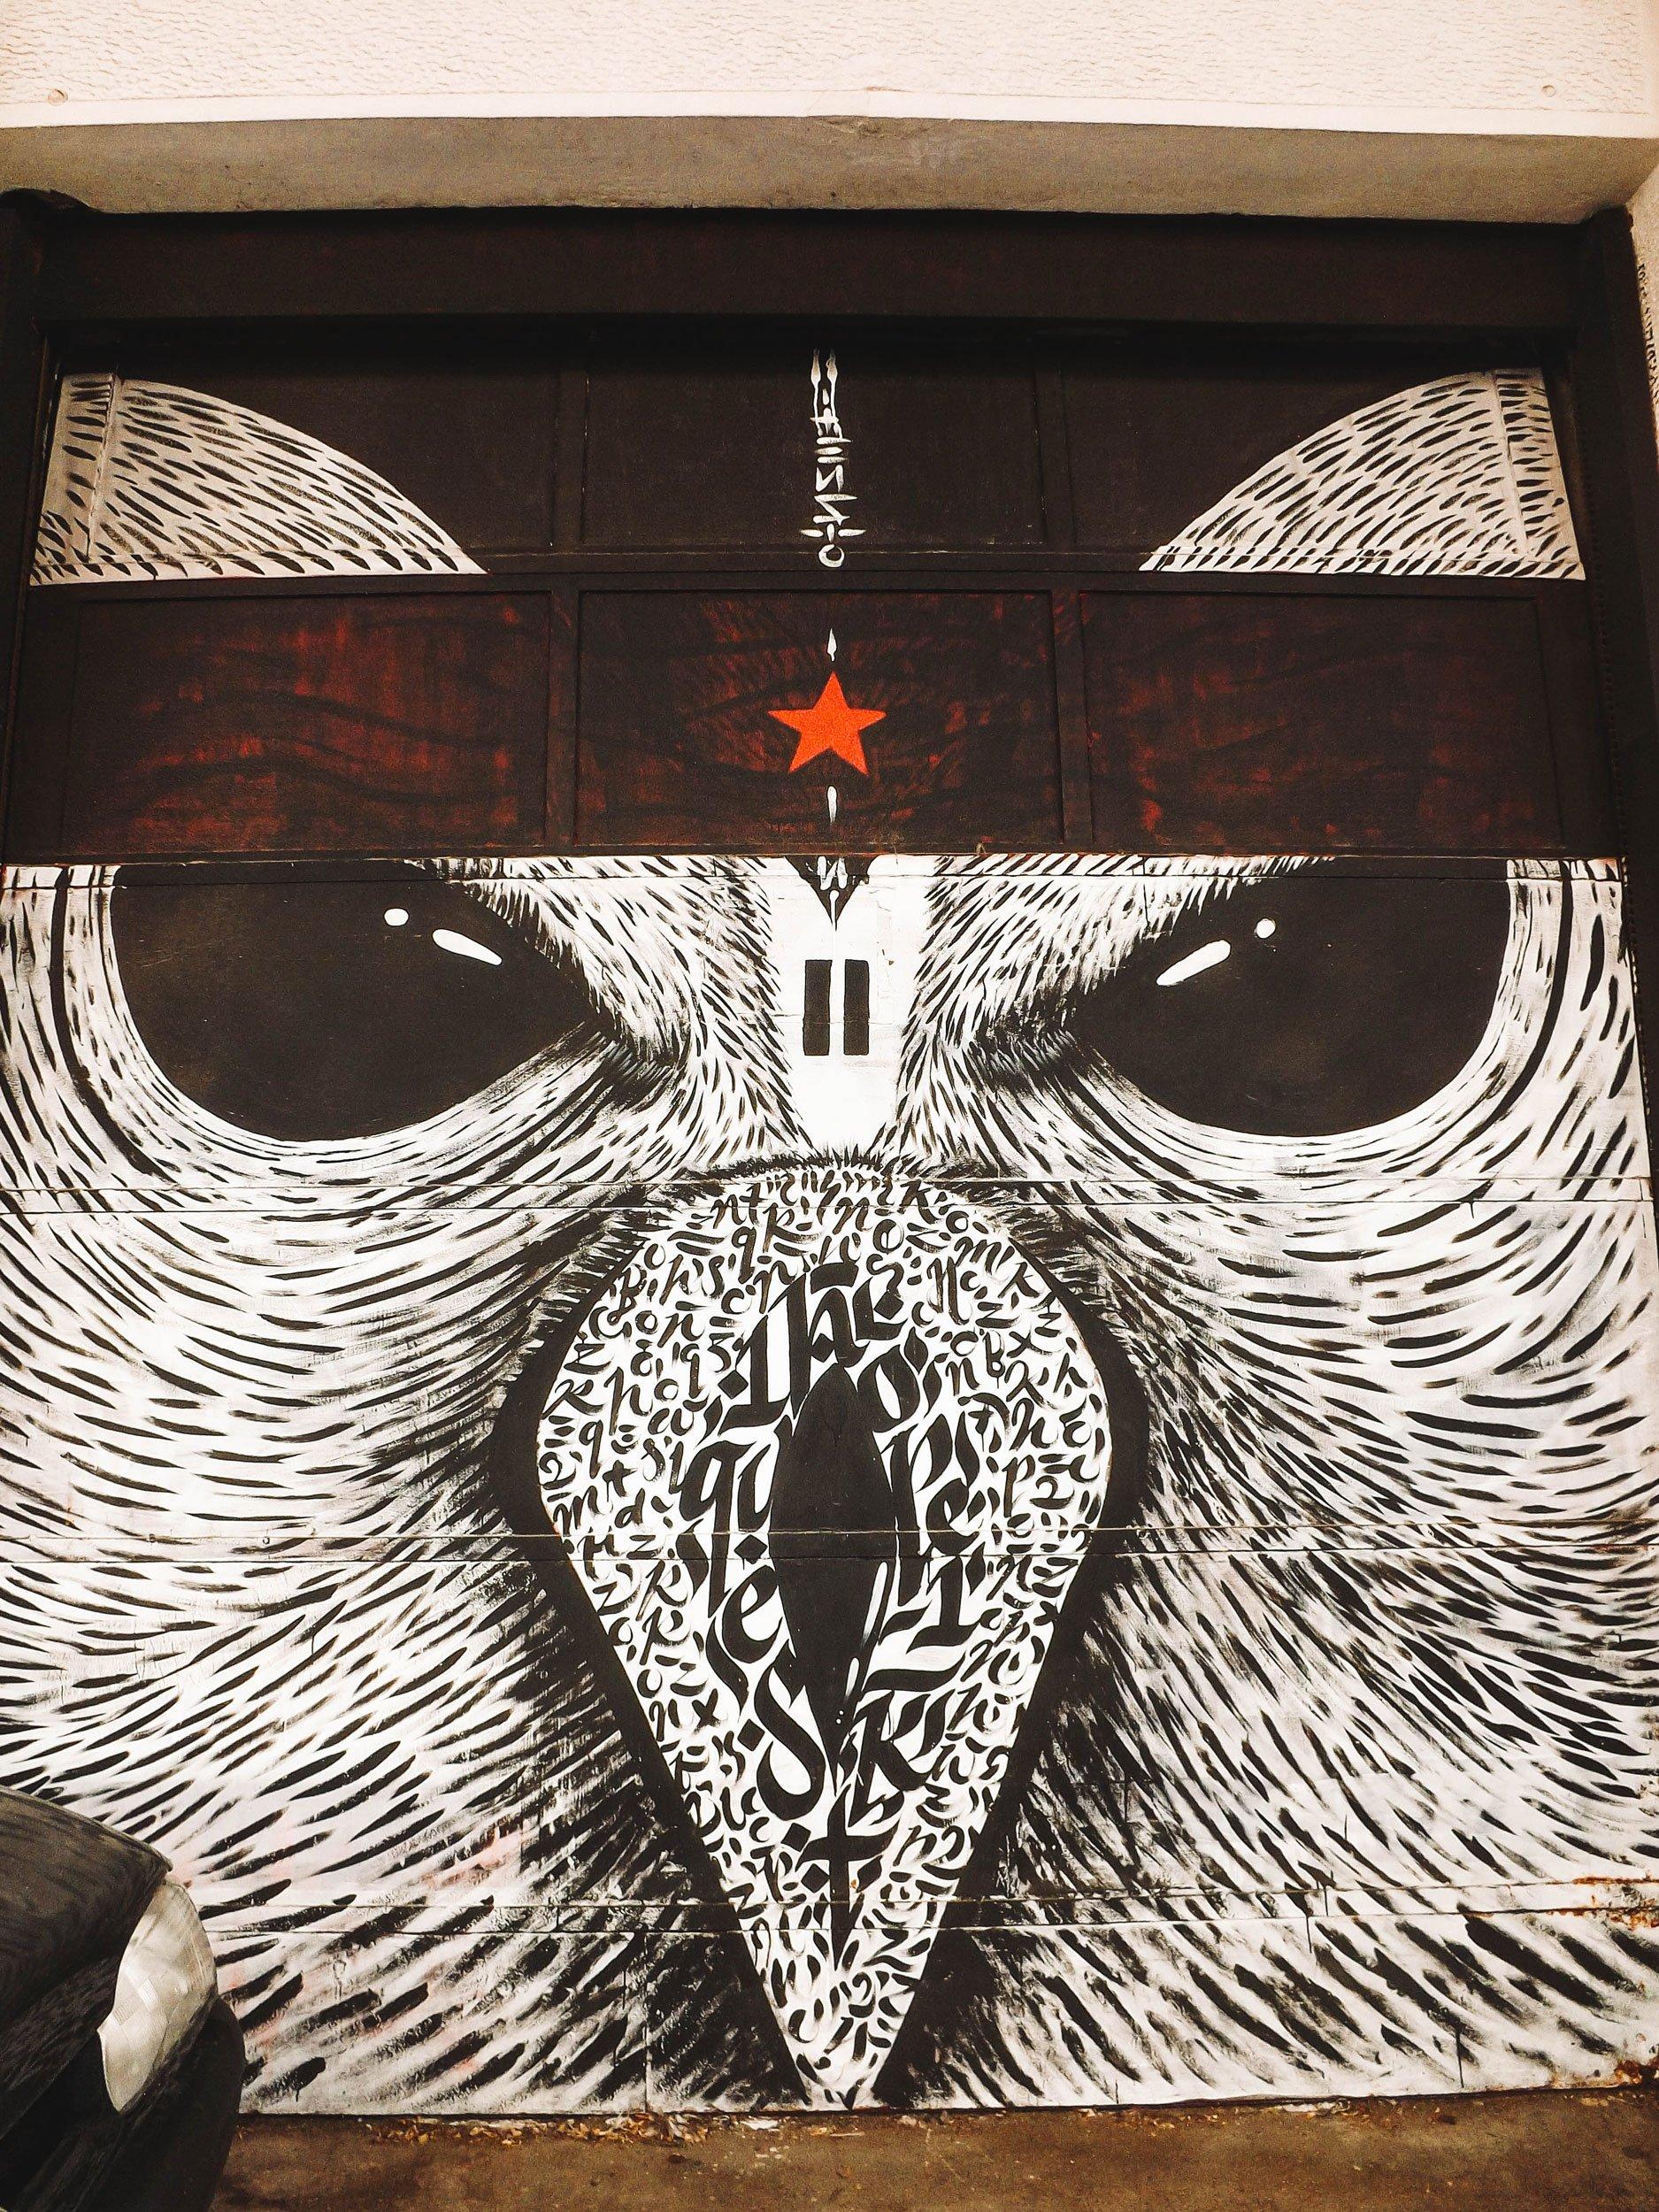 mural by Blaqk Athens | Best Street Art Cities